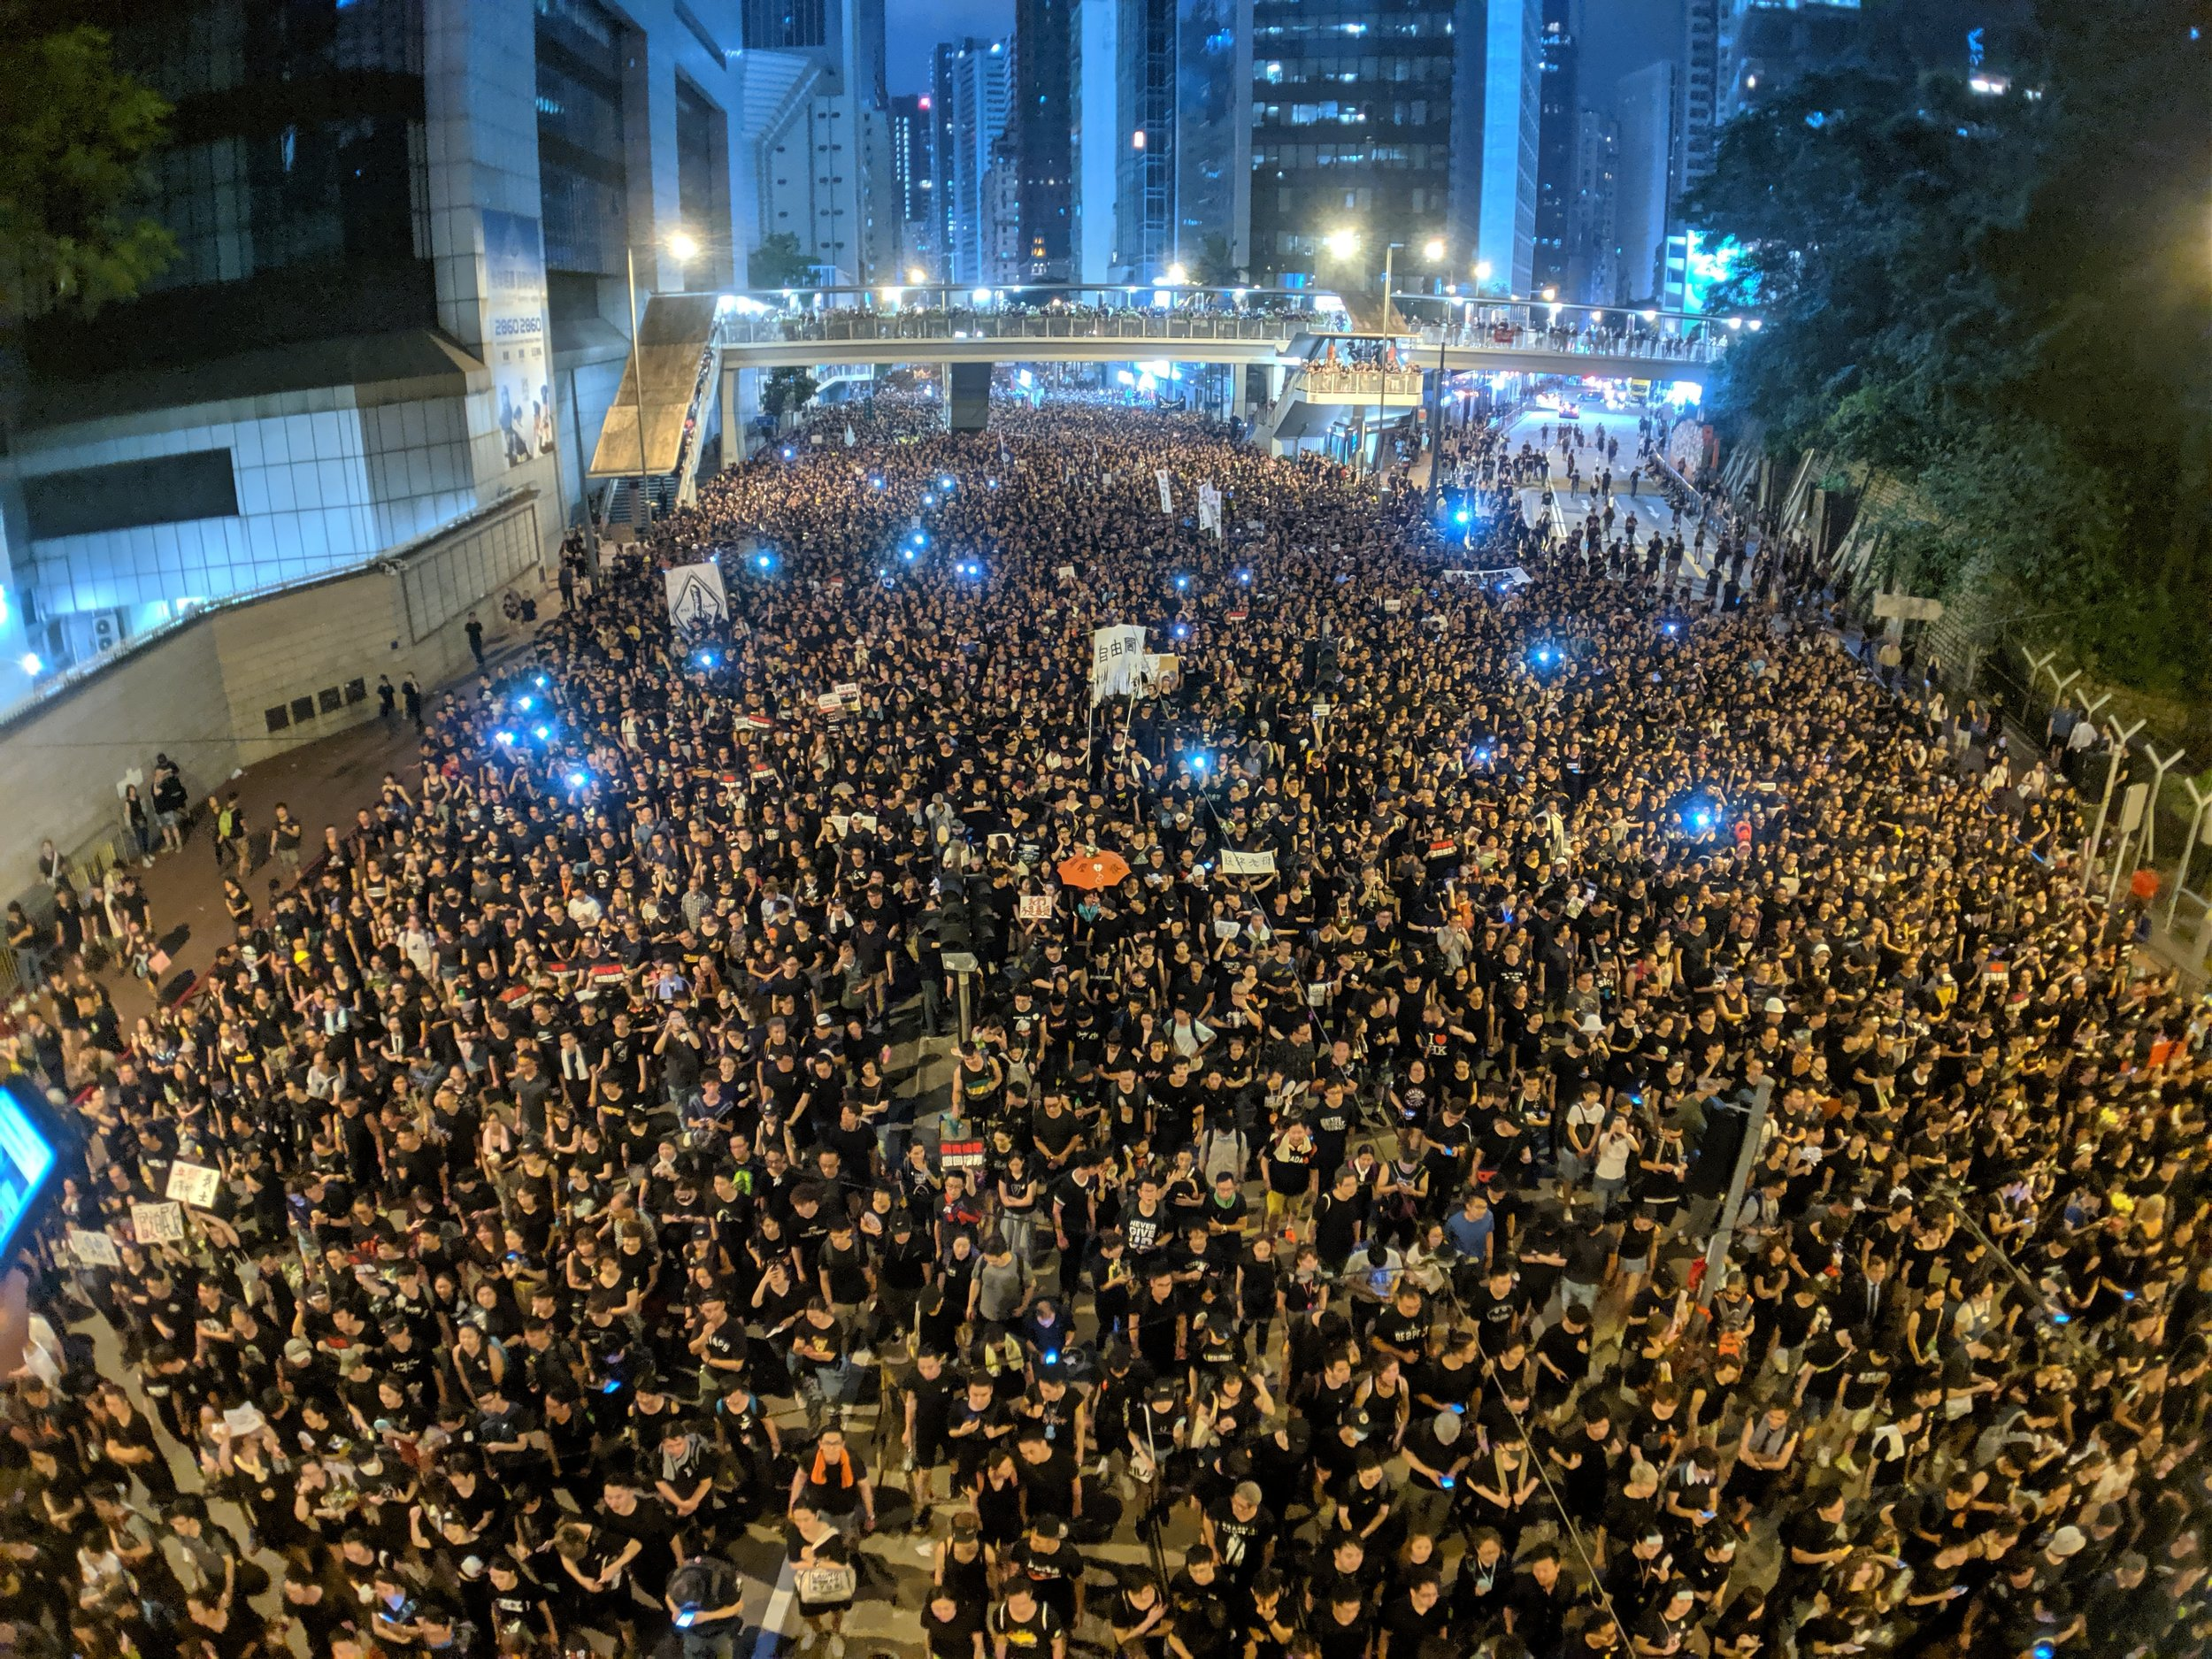 Demonstranten in Hong Kong (Bild: flickr.com/StudioIncendo)